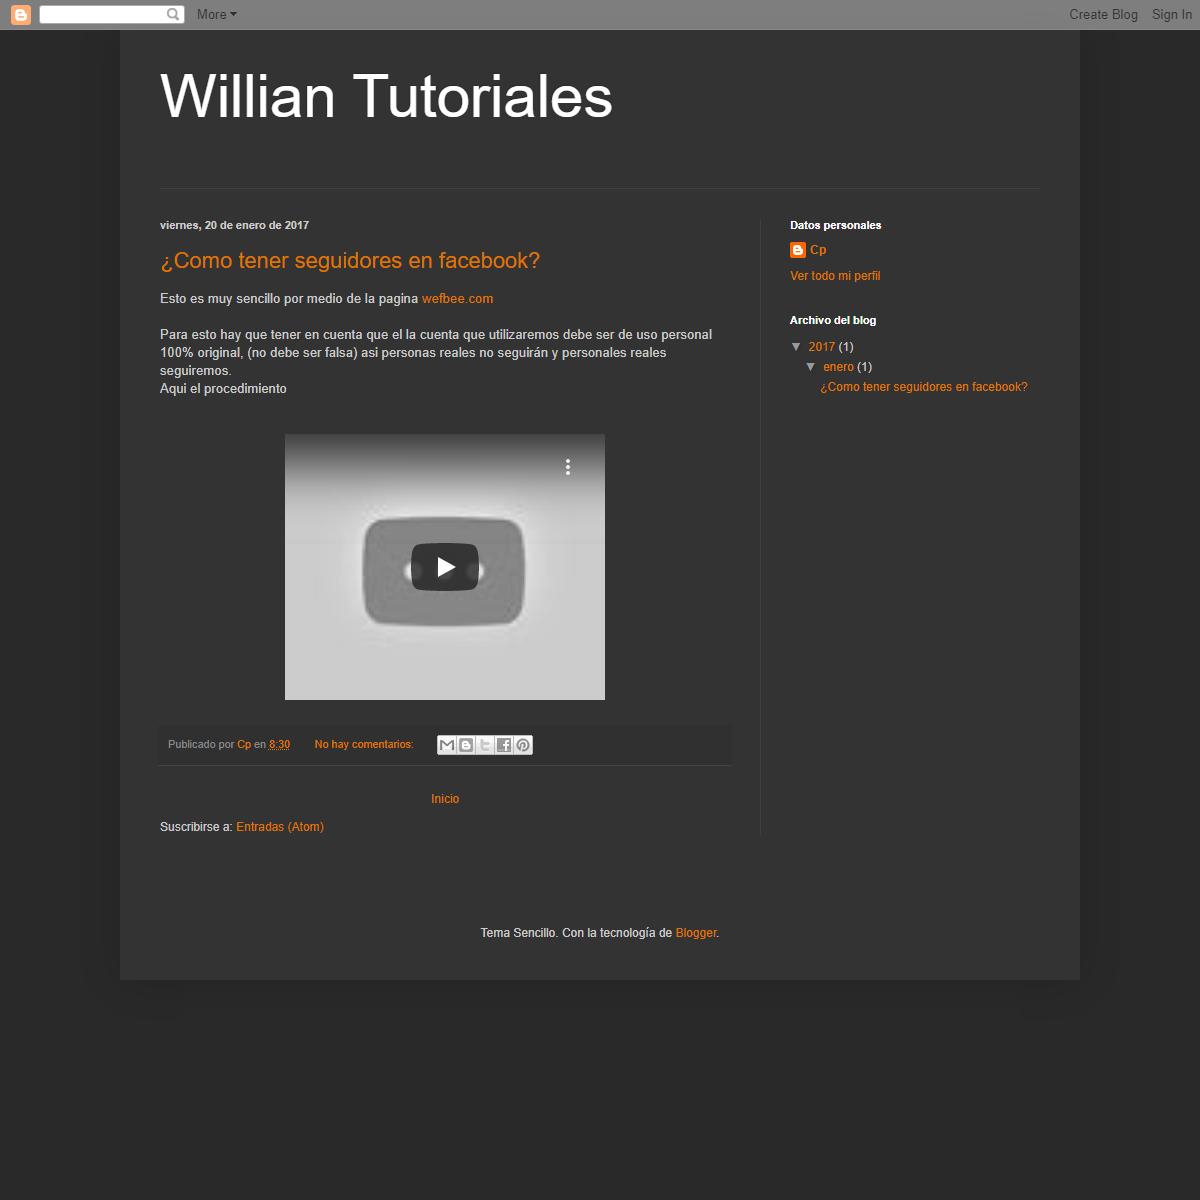 Willian Tutoriales